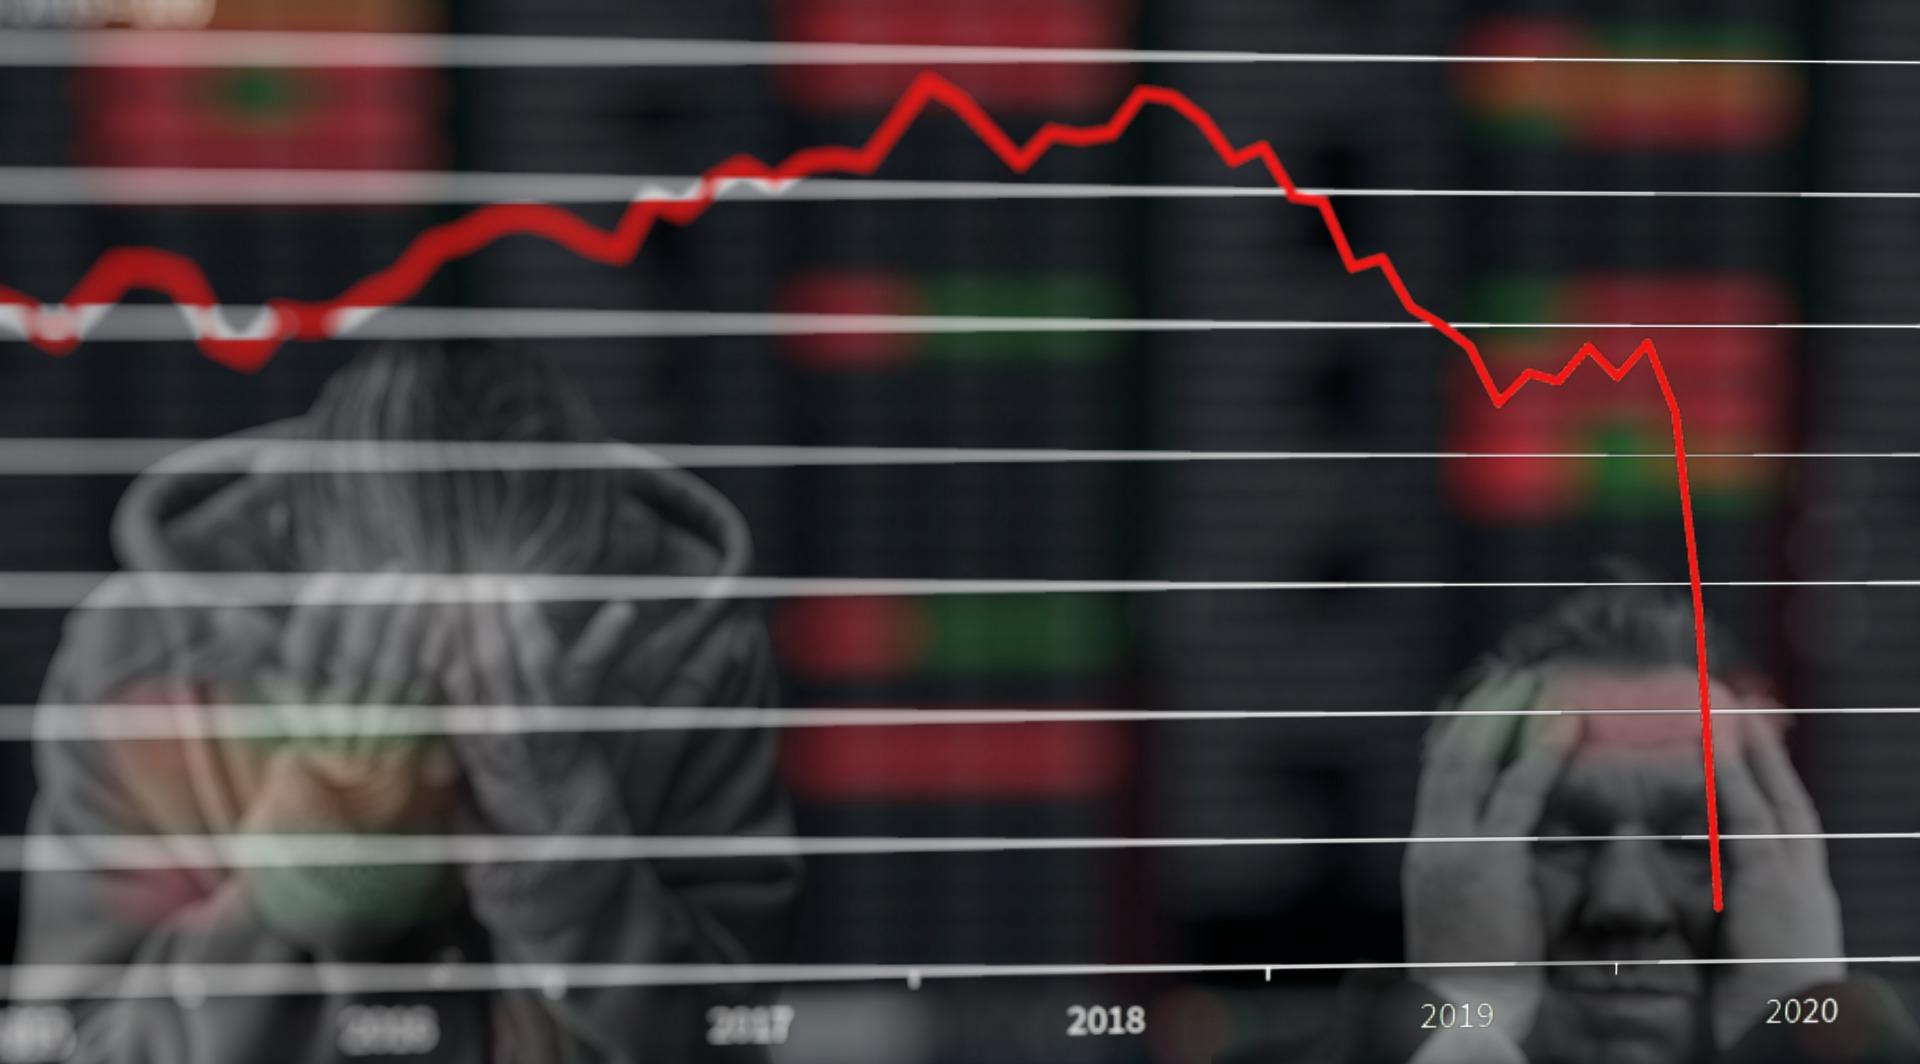 mercado-laboral-en-españa-2